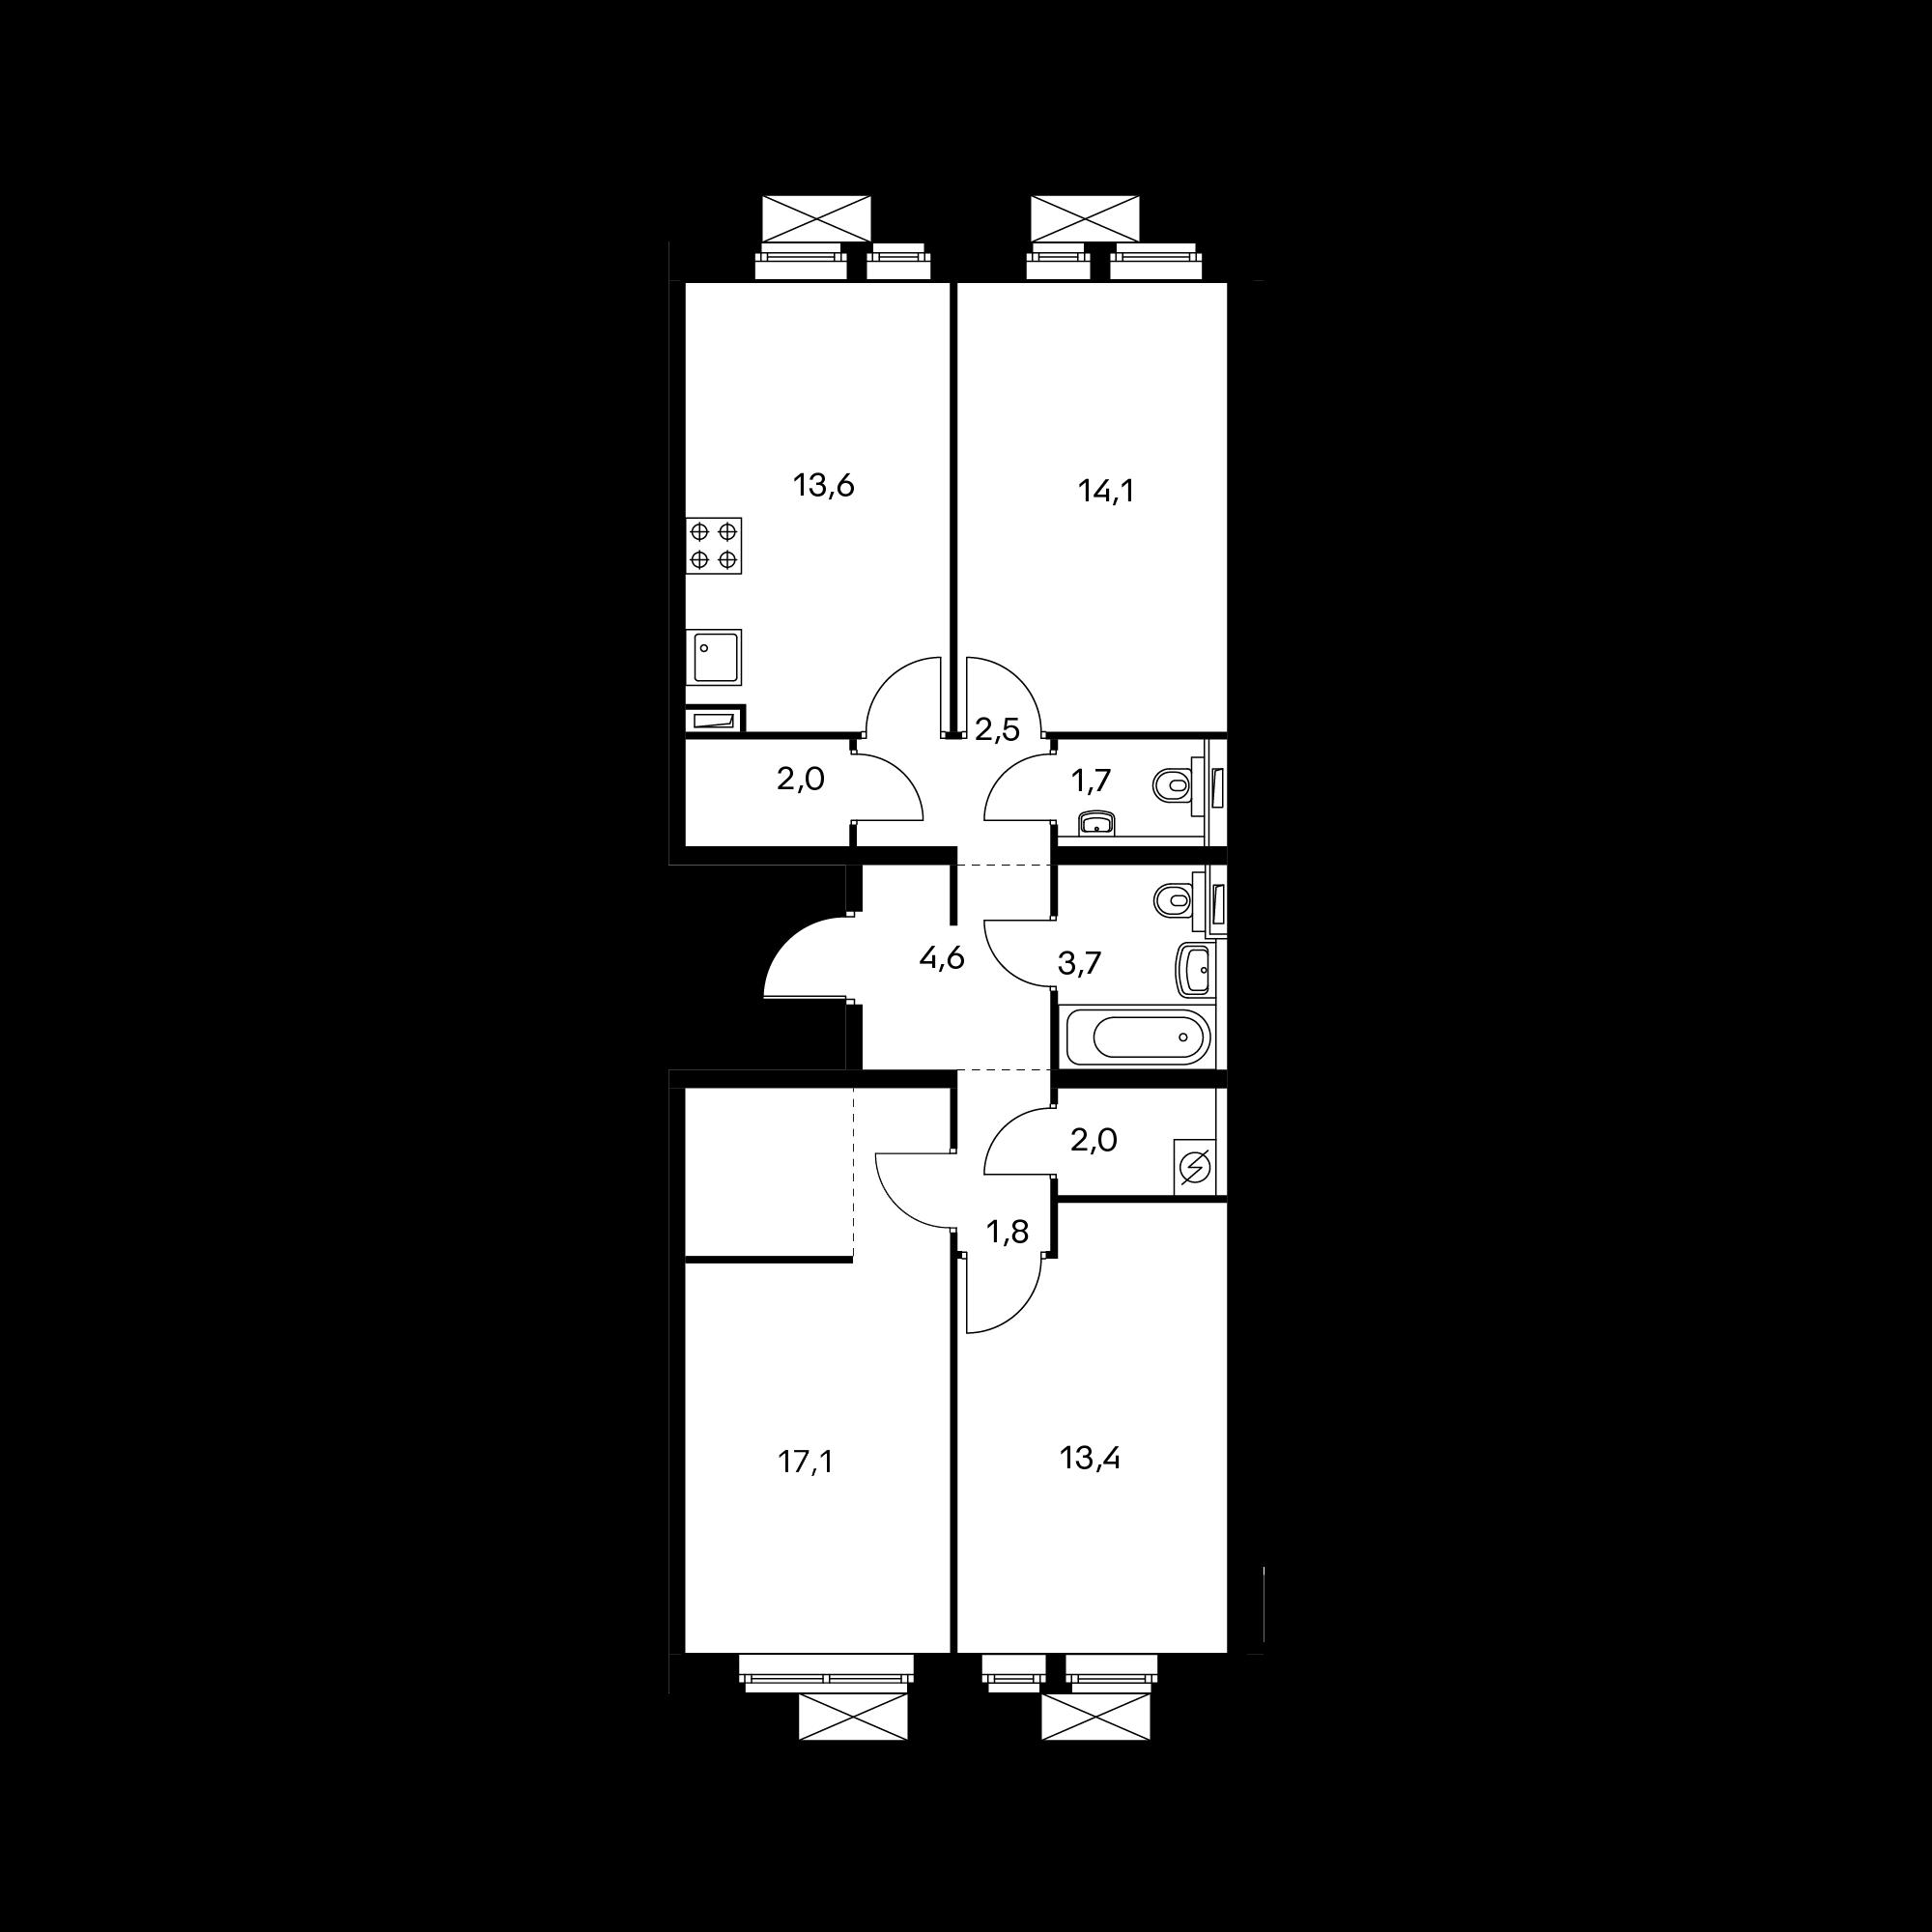 3KM15_6.0-1_S_Z1